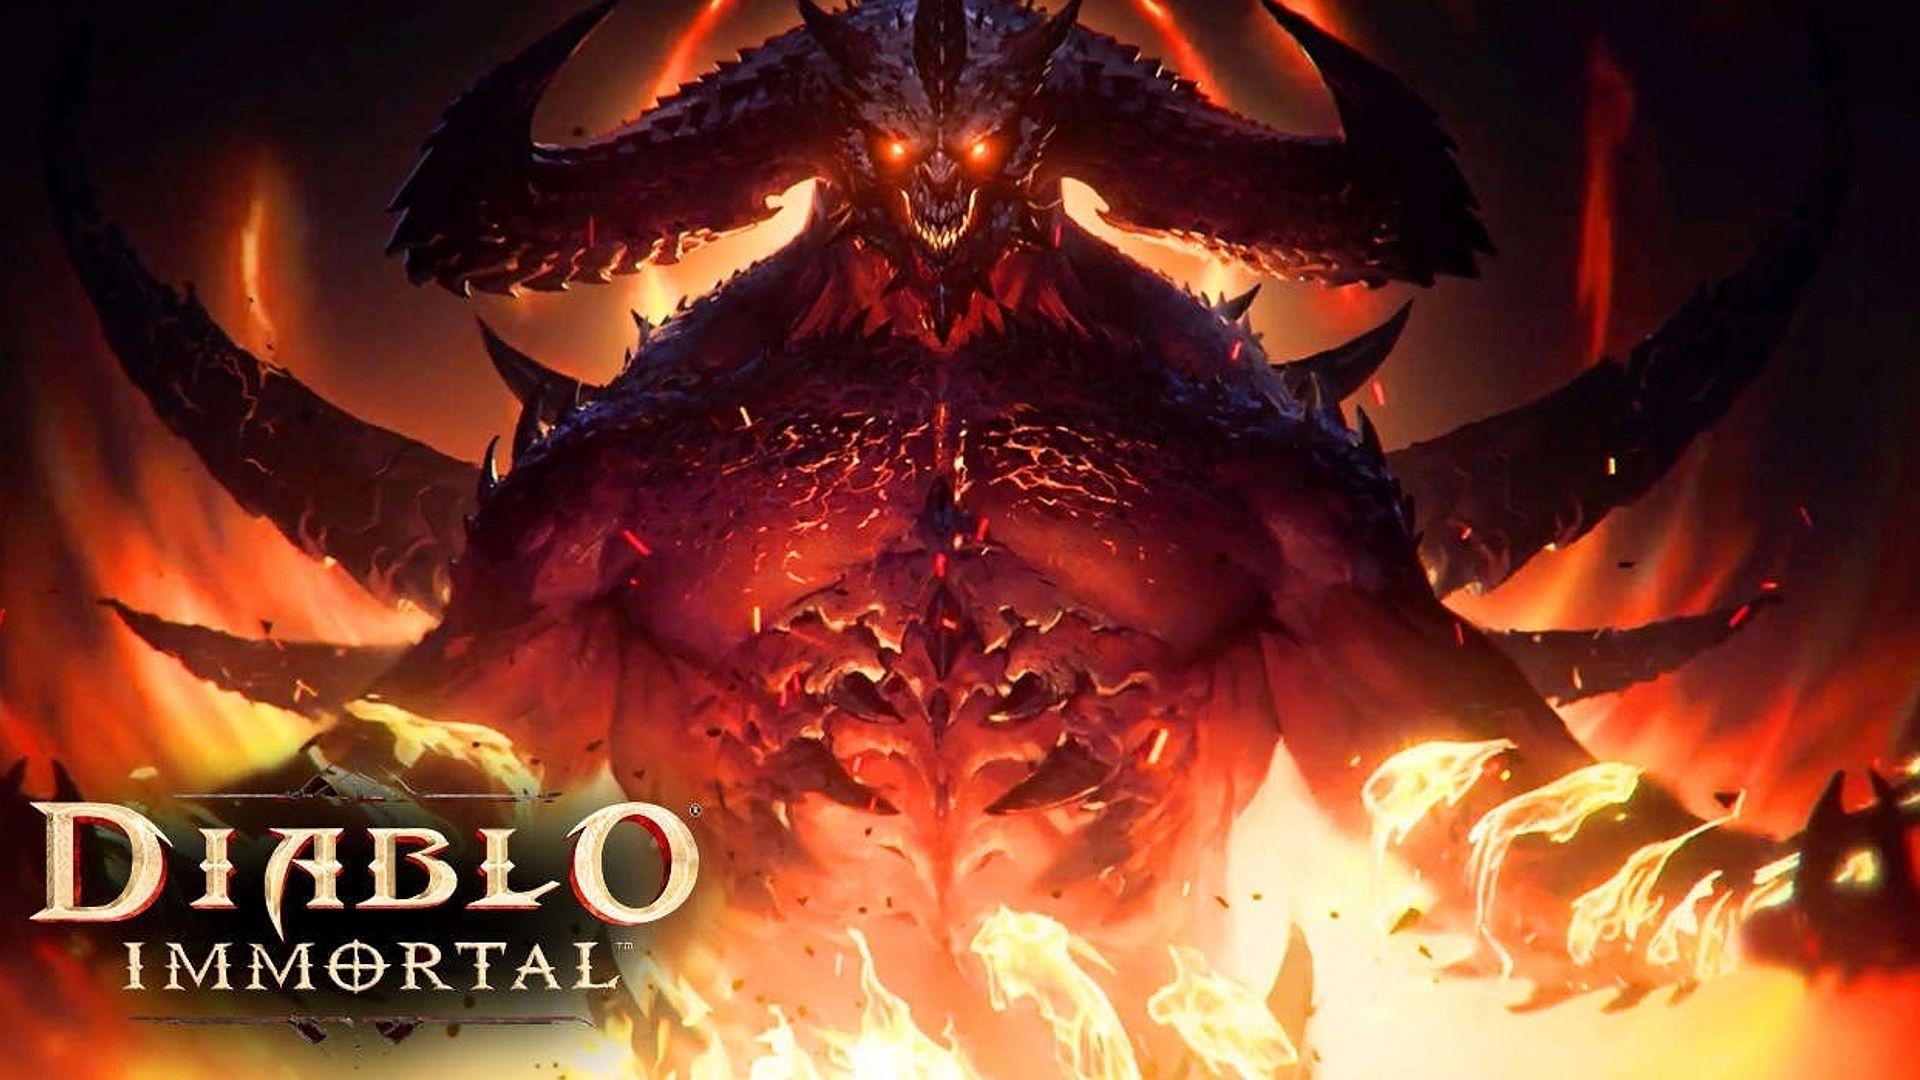 Diablo става игра за телефони